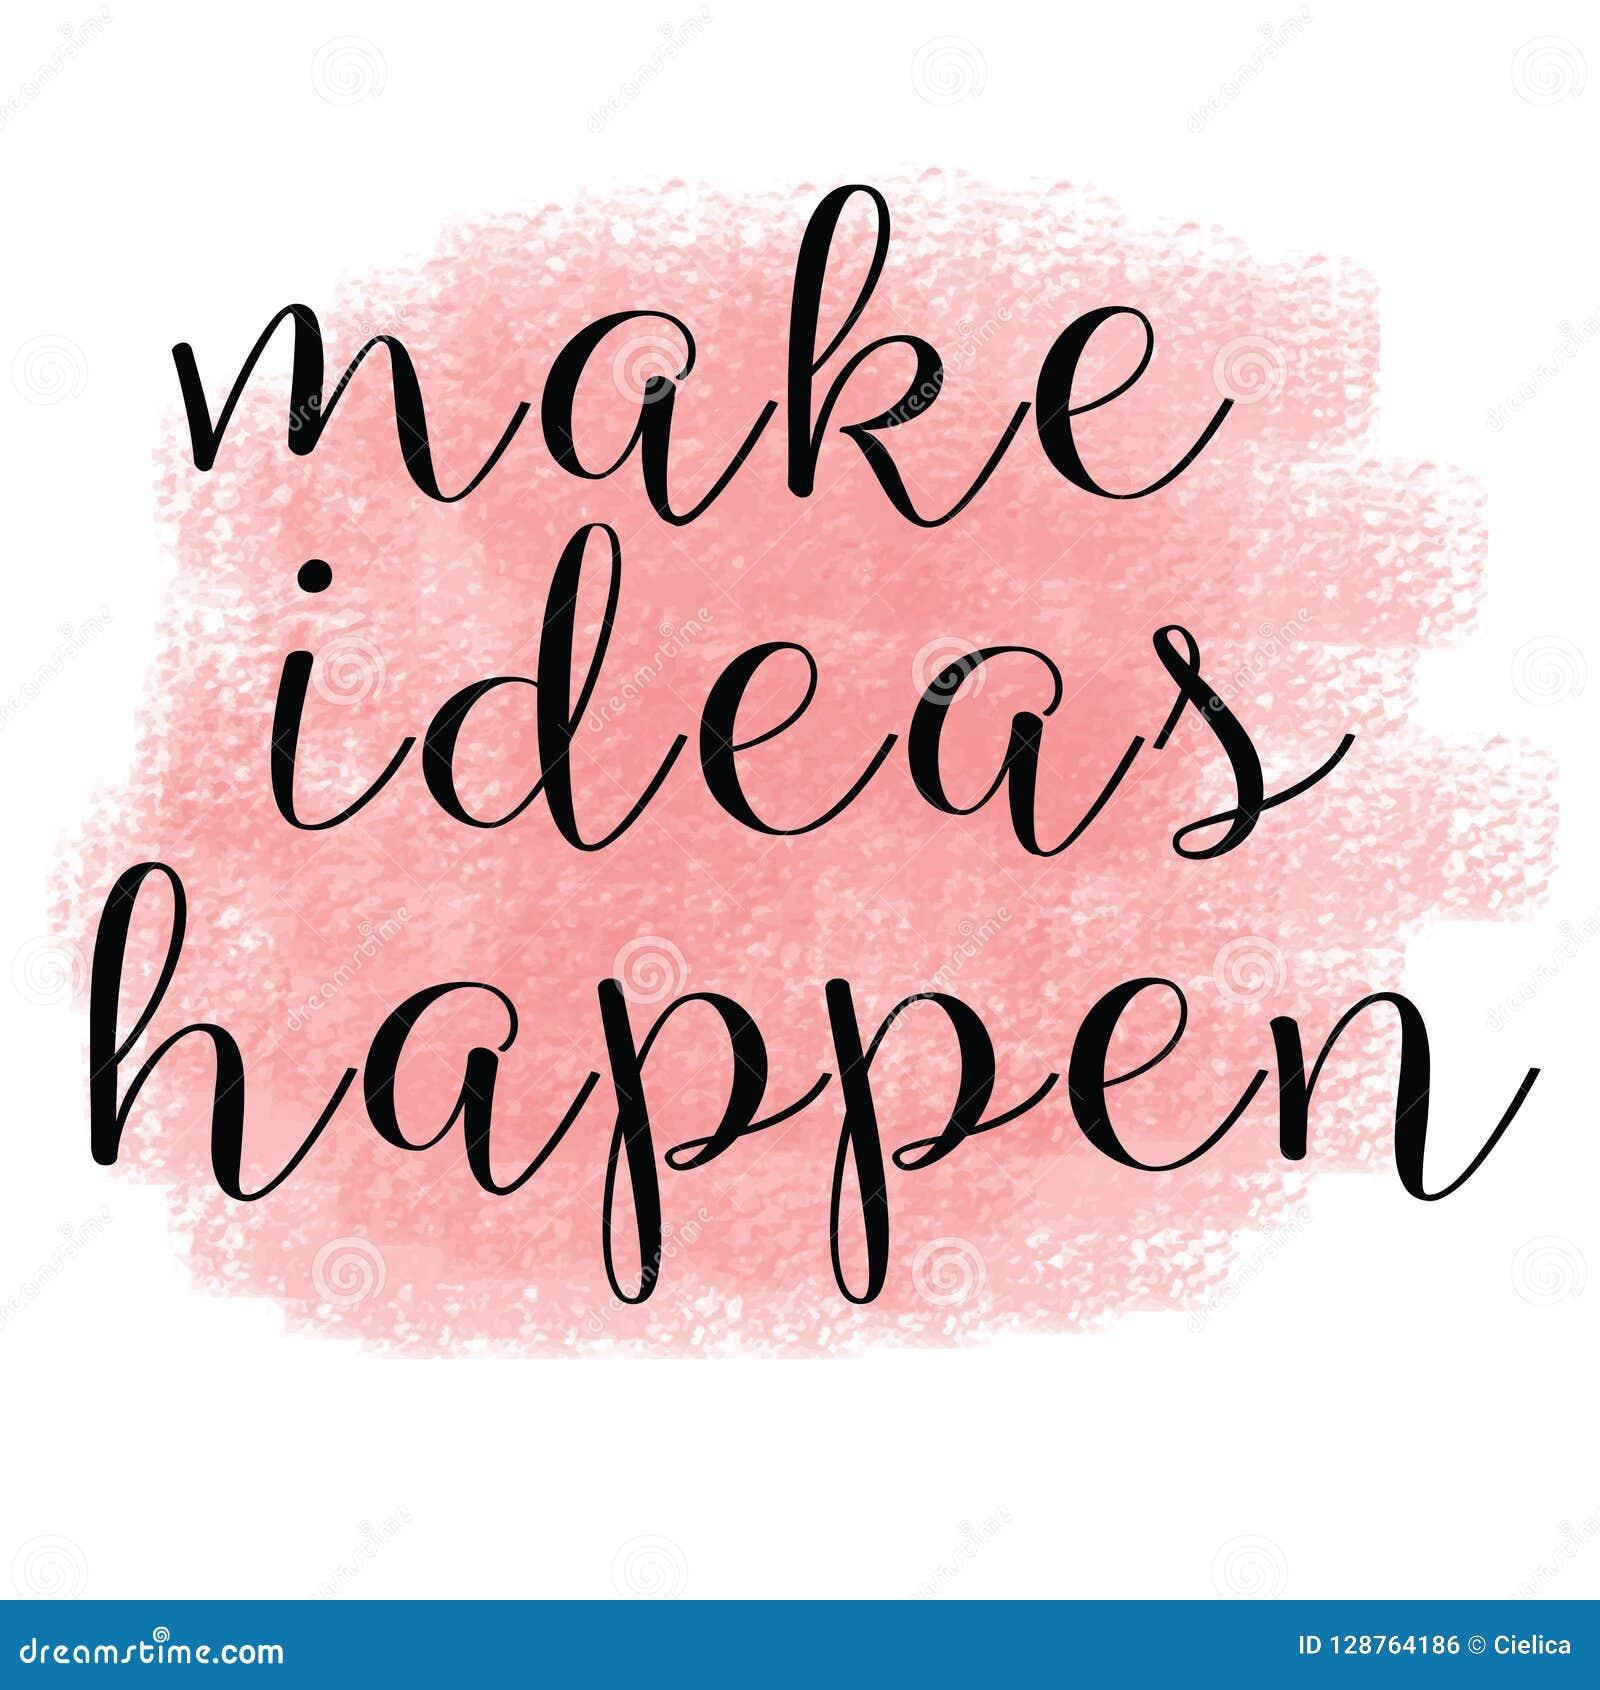 Maak ideeën gebeuren Inspirational citaten